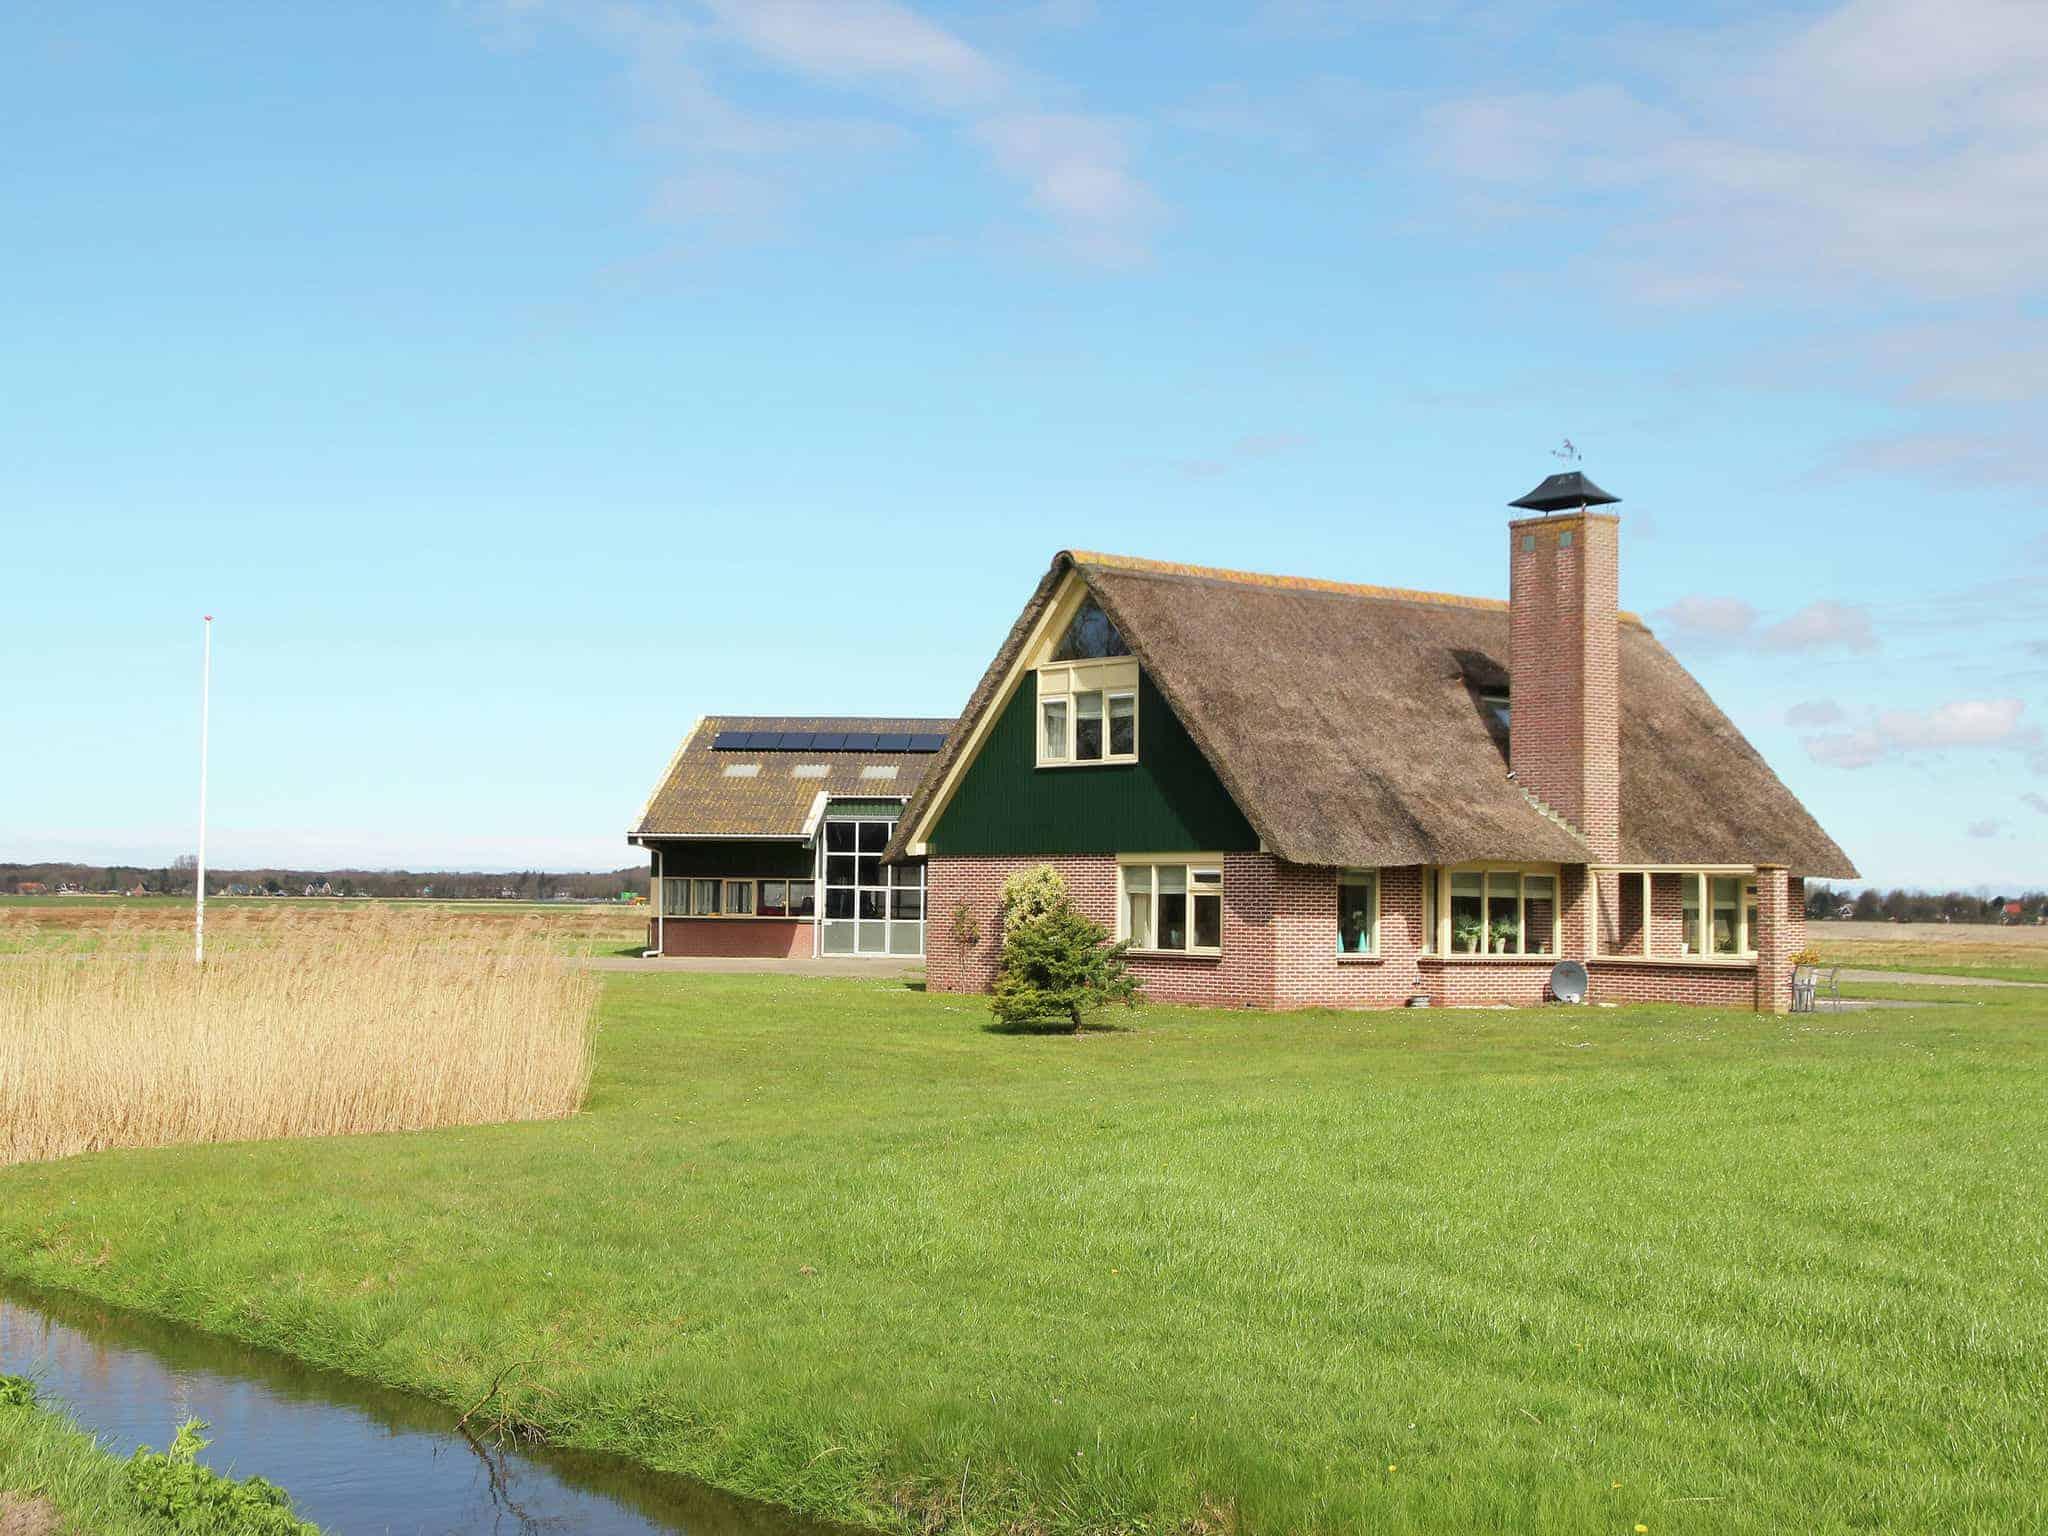 Vakantiehuis 30553 - Nederland - Noord Holland - 8 personen